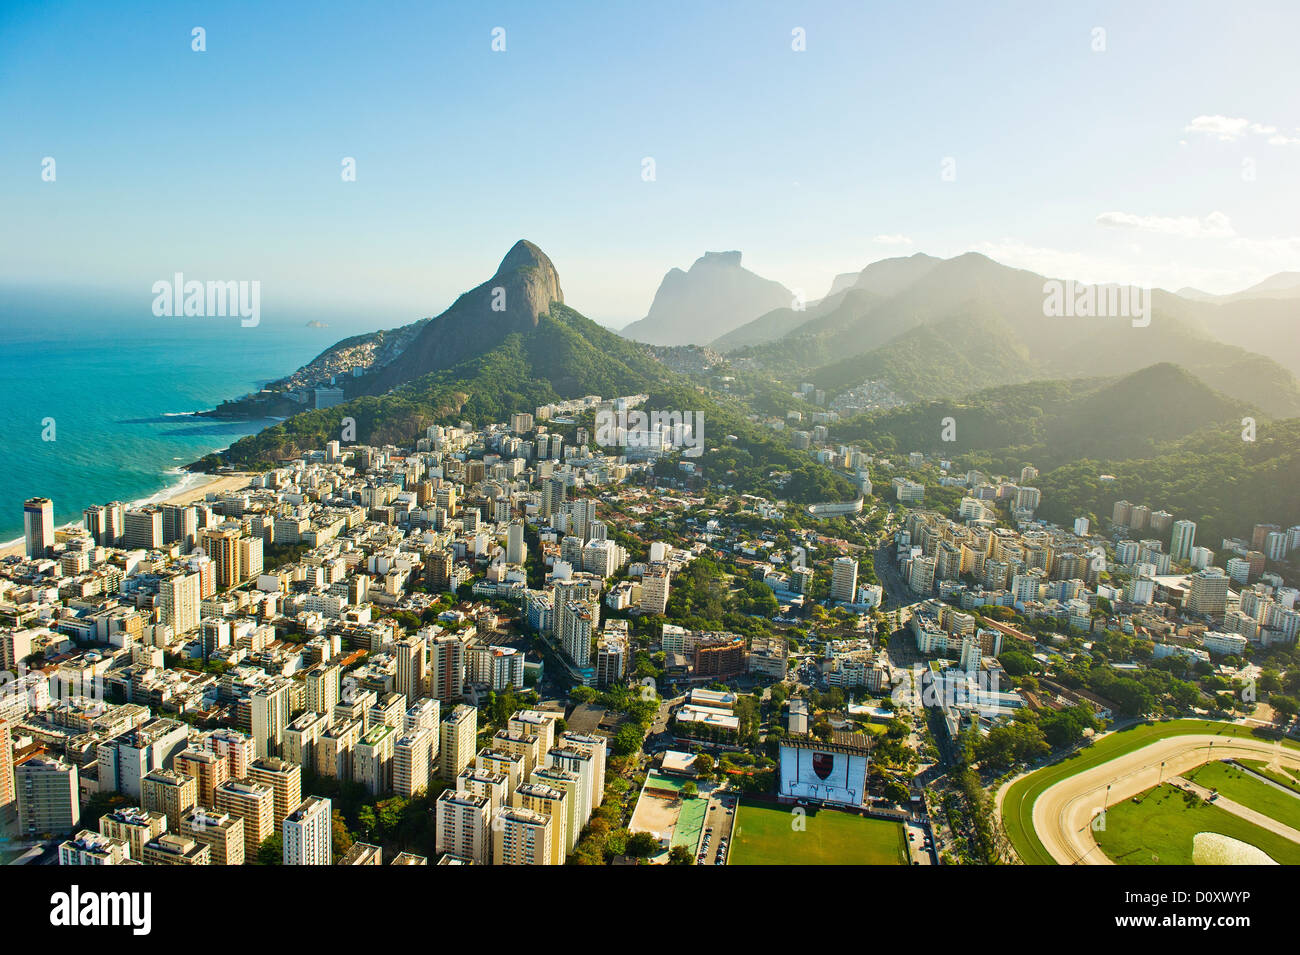 Vue aérienne de Lagoa et Ipanema, Rio de Janeiro Brésil Photo Stock